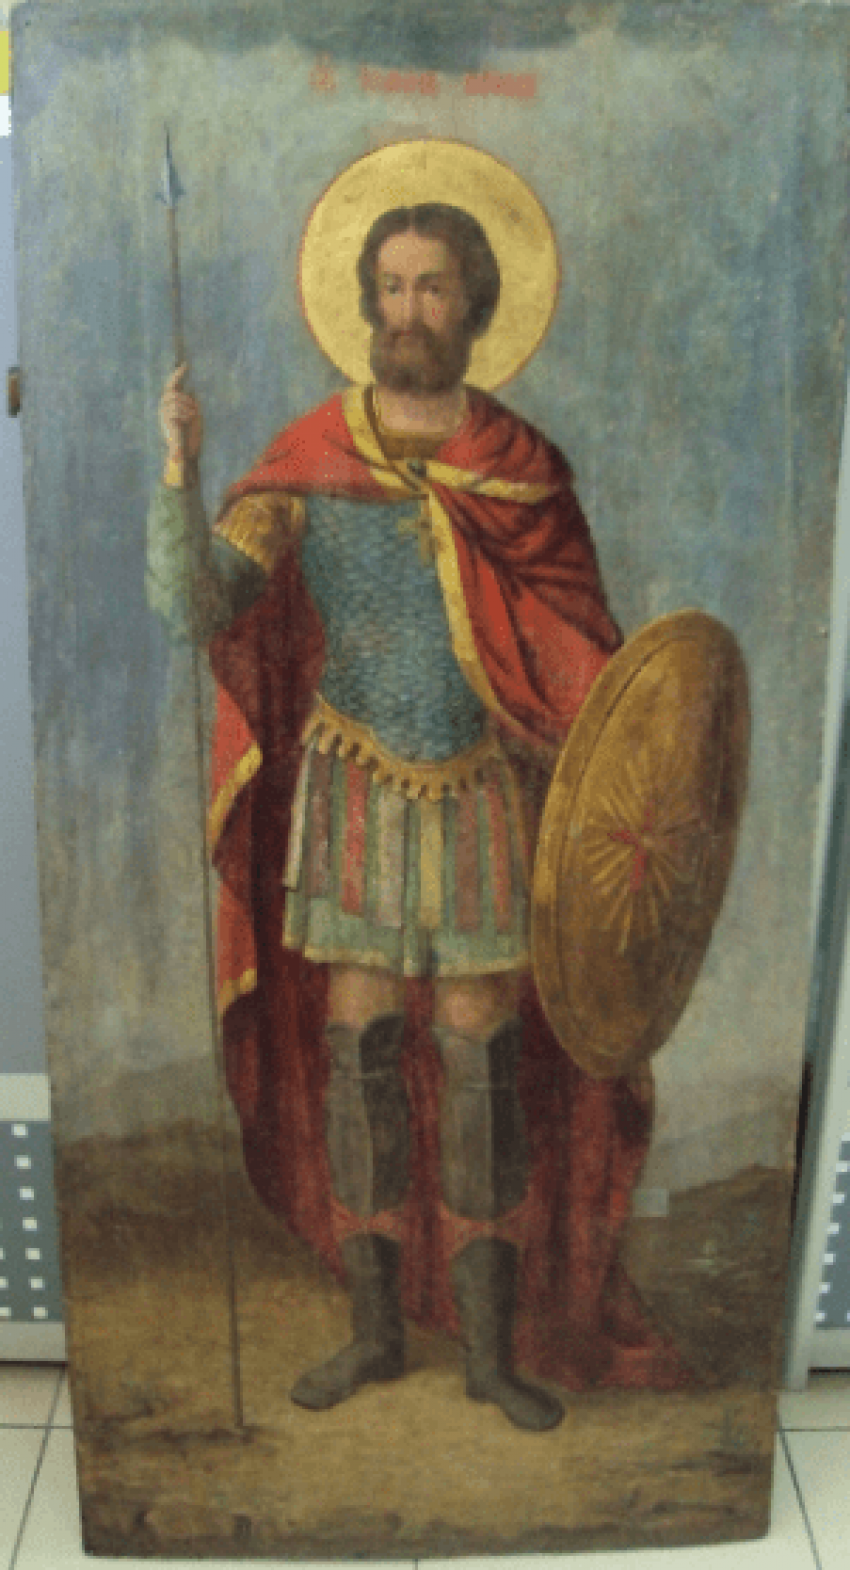 the icon of Ivan the Warrior 107.5 cm - photo 1